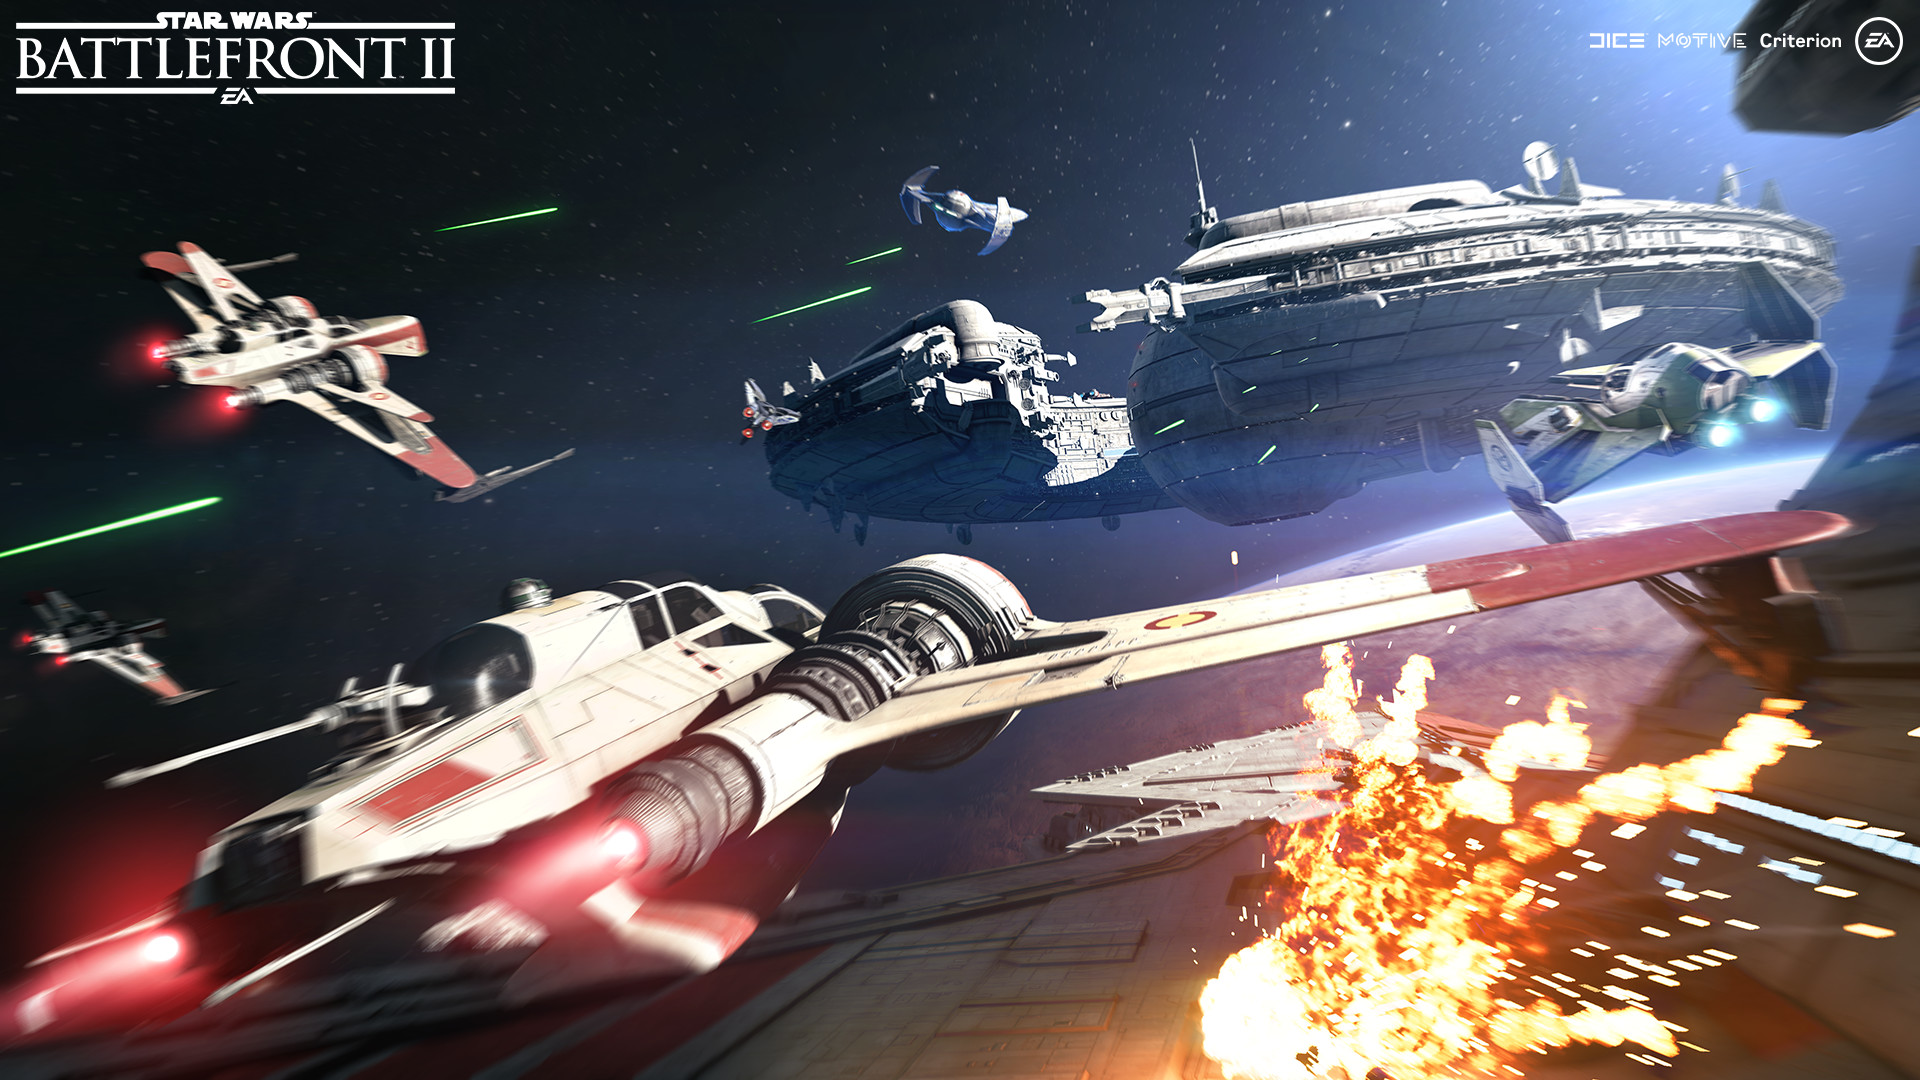 Star Wars Battlefront II Pre-Alpha Runs at 1080P@60 on PlayStation 4 Pro